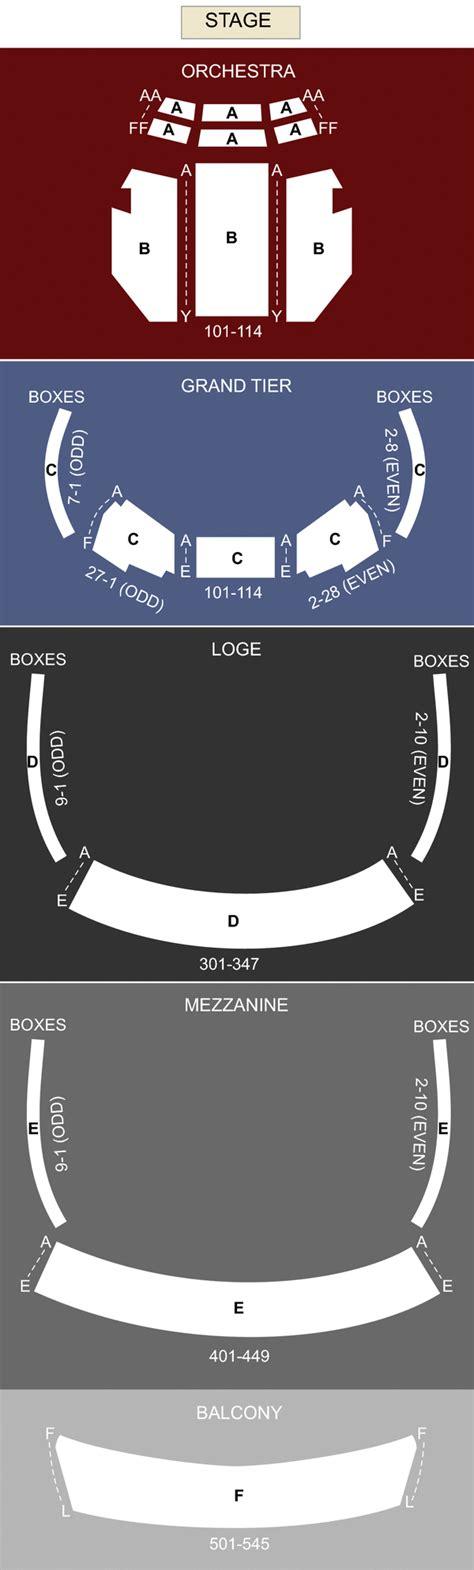 kravis center seating chart dreyfoos dreyfoos concert west palm fl seating chart